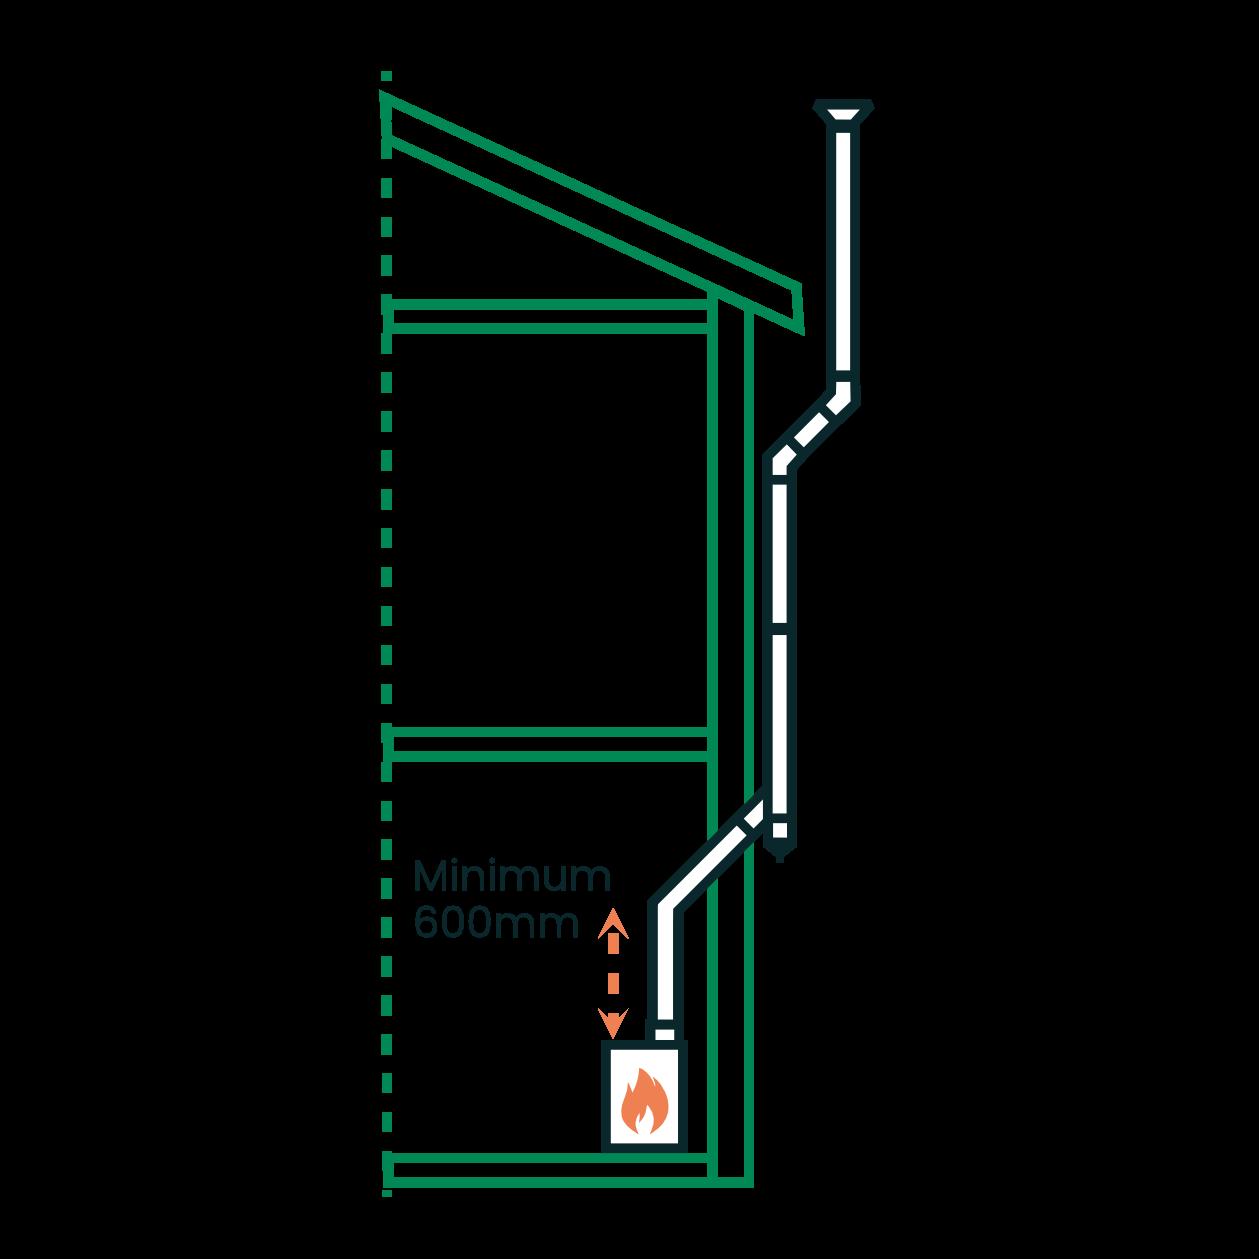 Minimum vertical length diagram